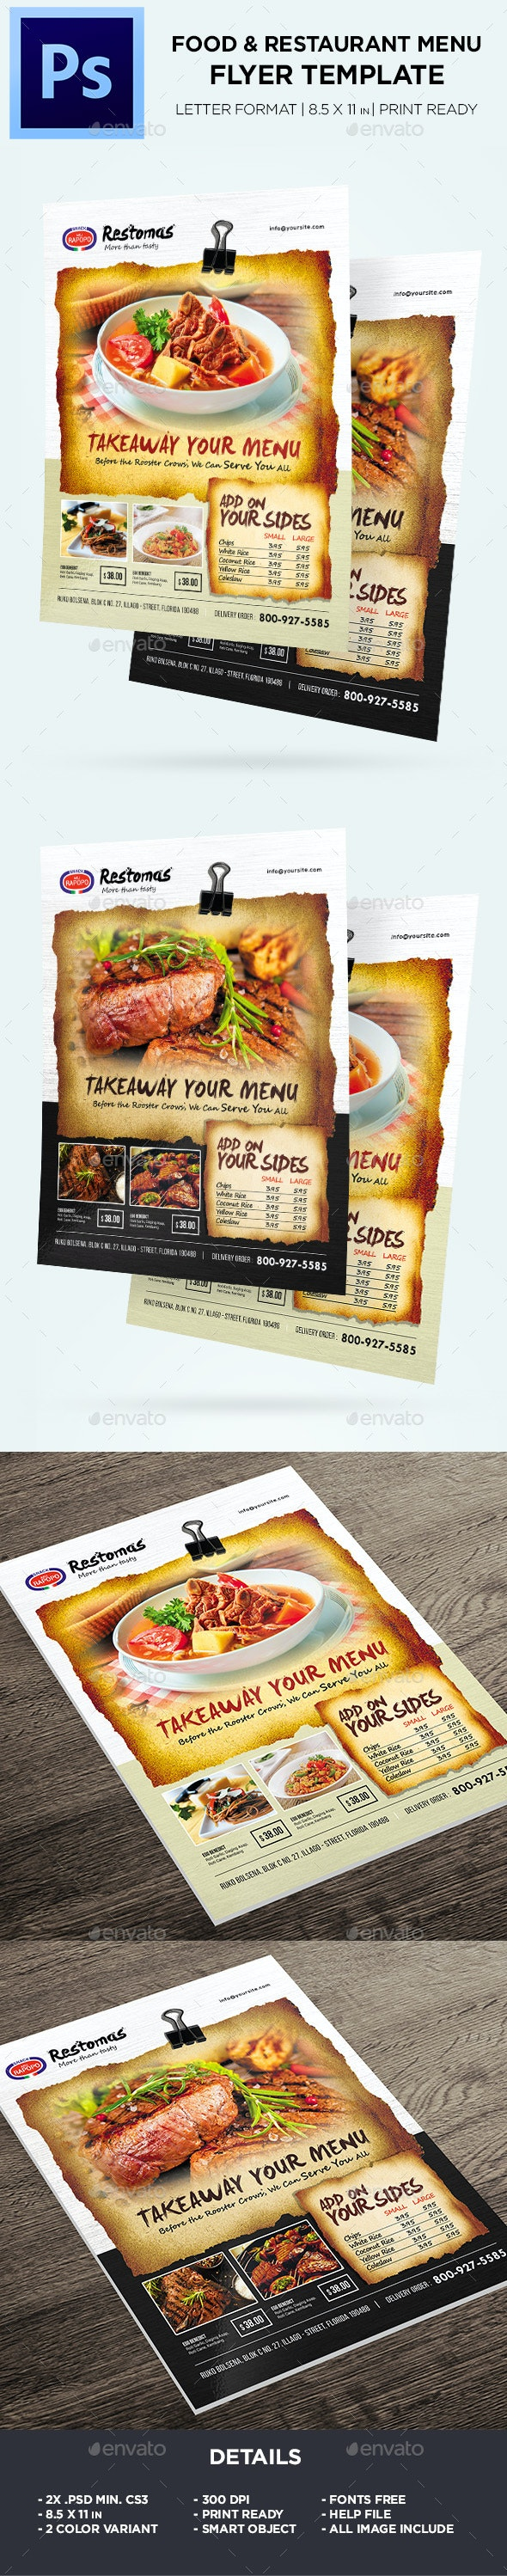 Food Menu - Restaurant Menu Flyer - Food Menus Print Templates